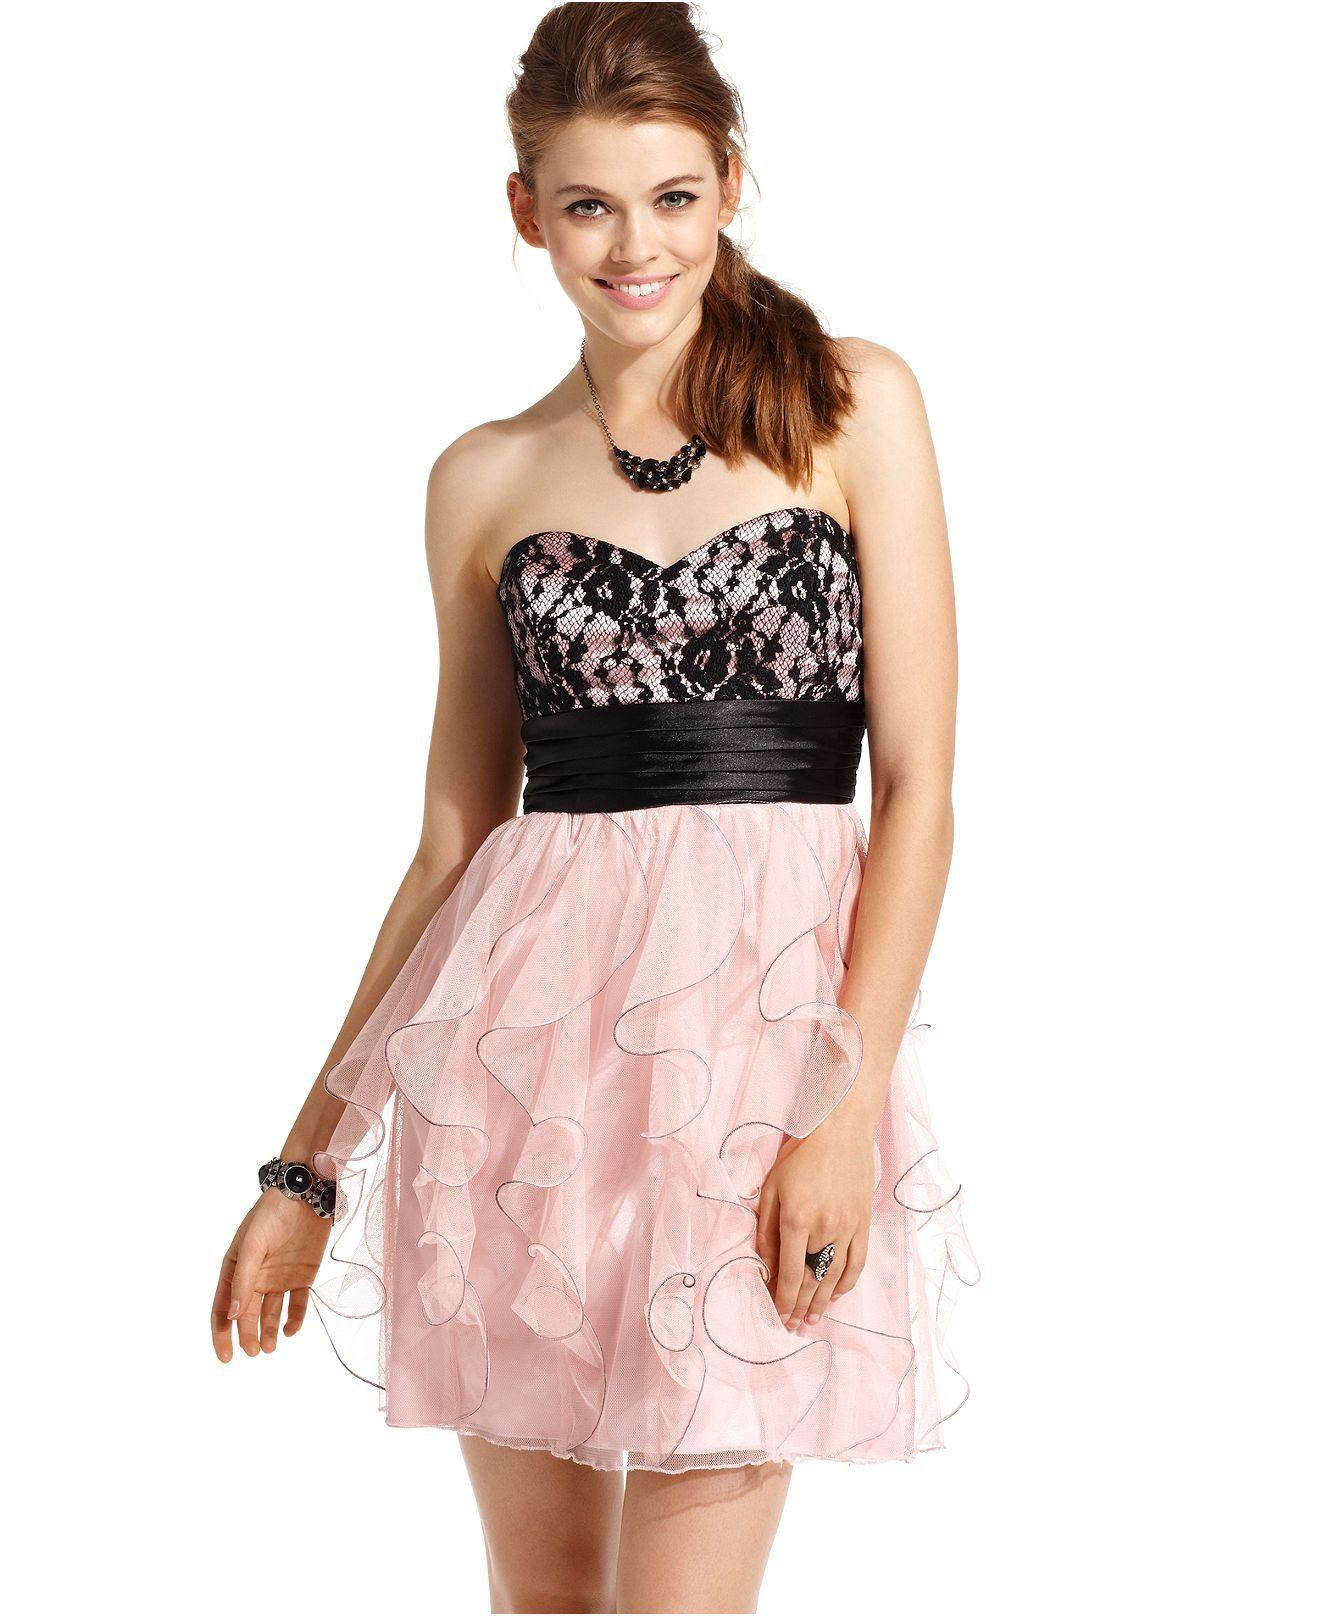 Original dress simple pinterest originals